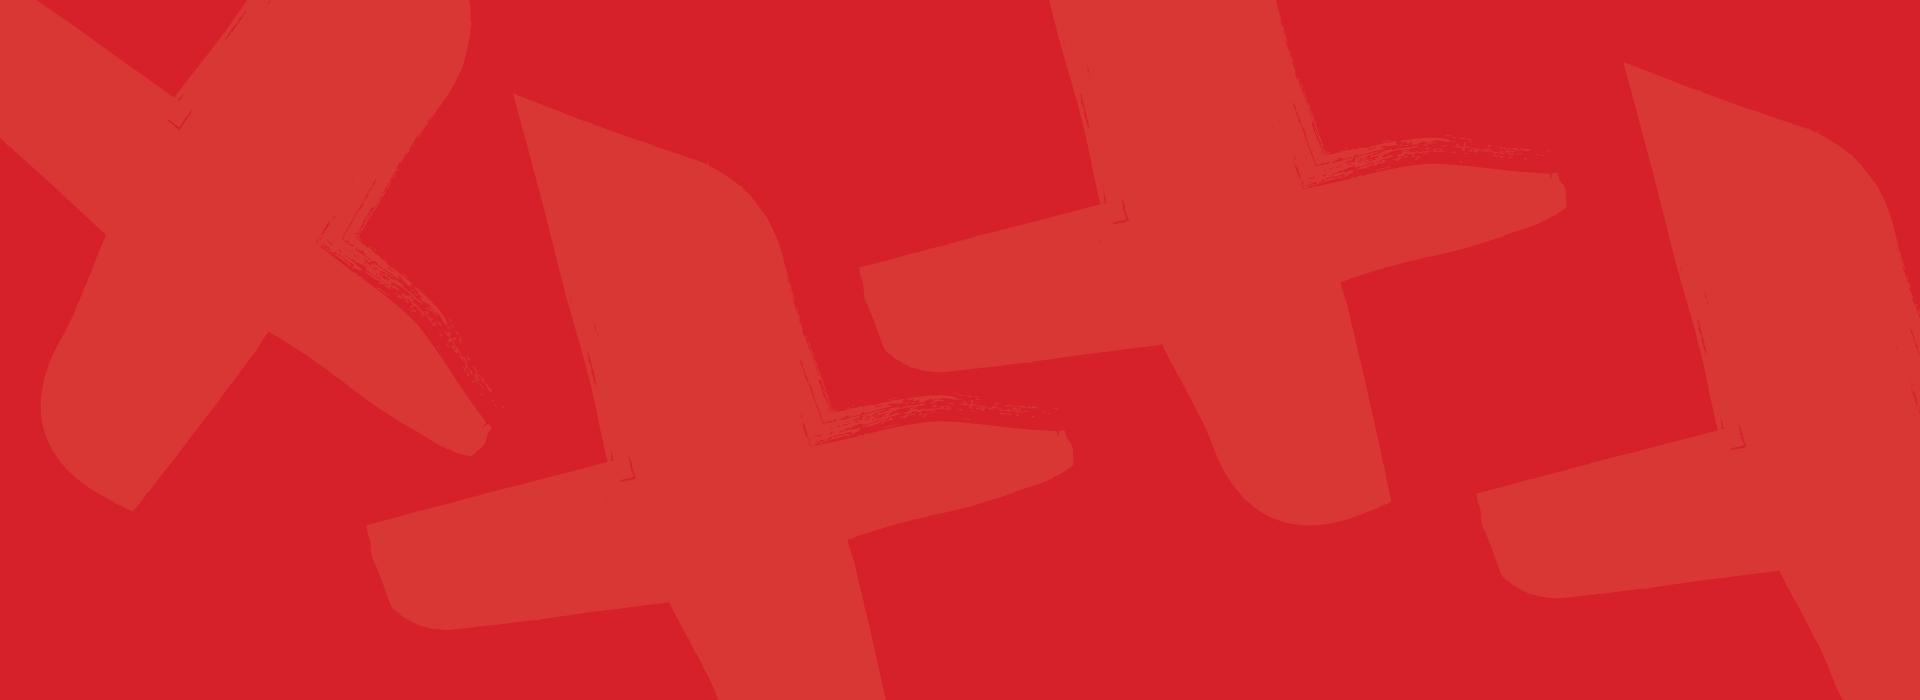 5×1000-arci-fondo-rosso-piu